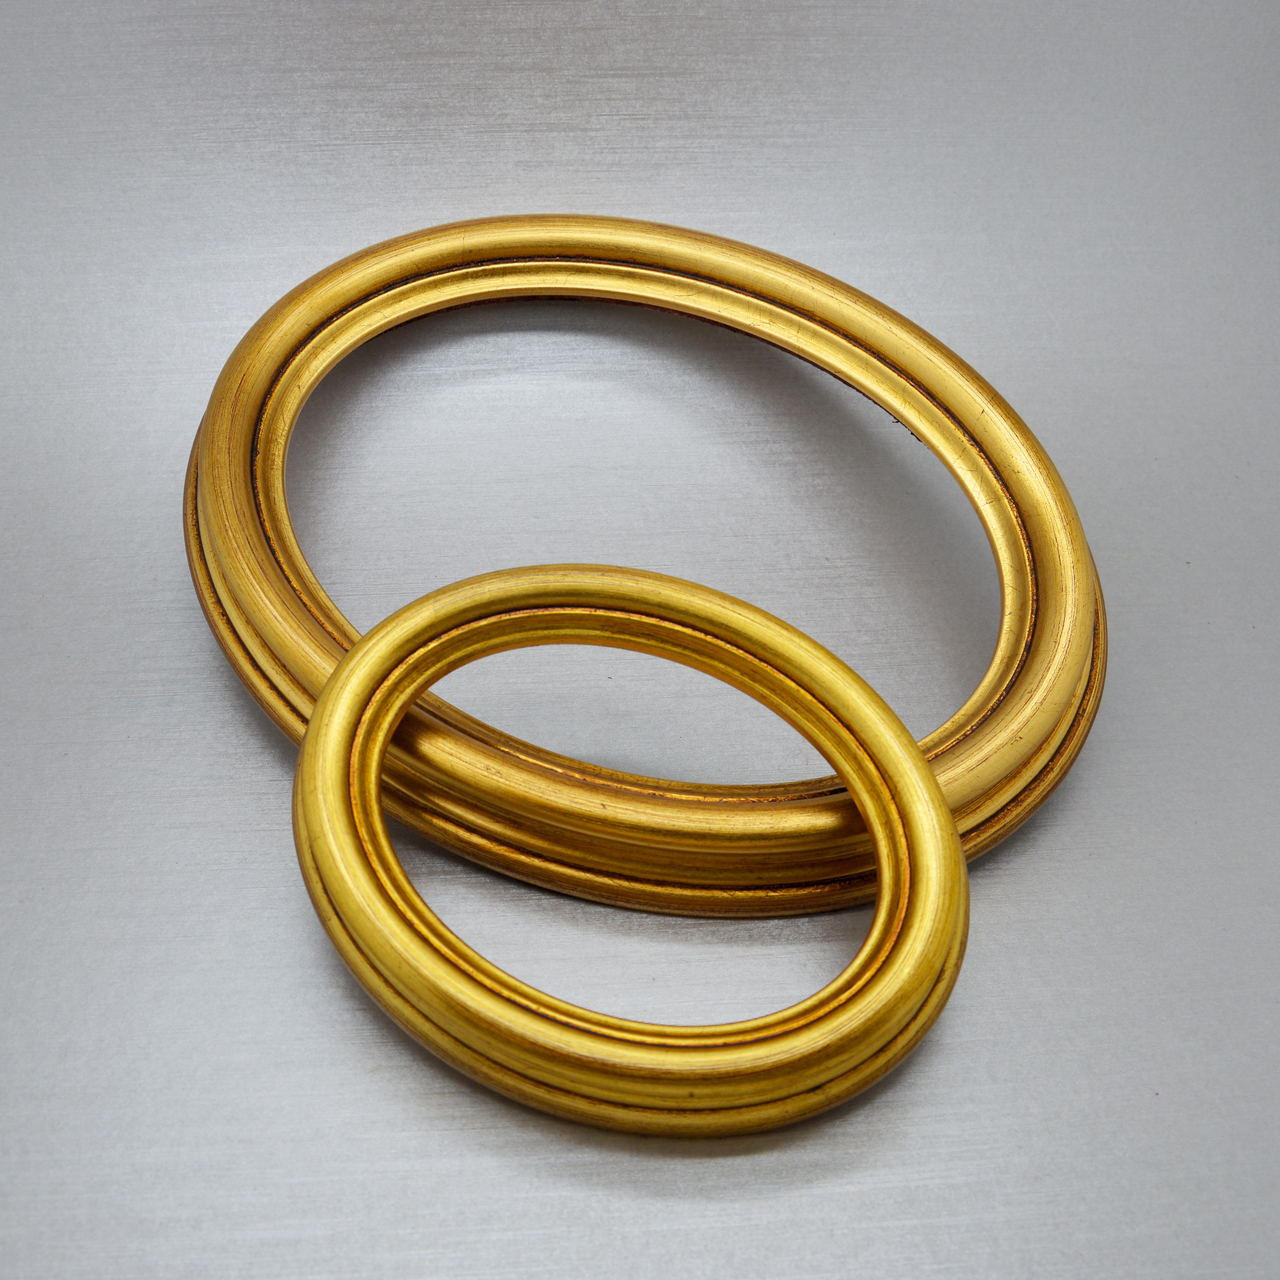 Centro cornici cornici ovali dorate vuote ovali for Cornici online